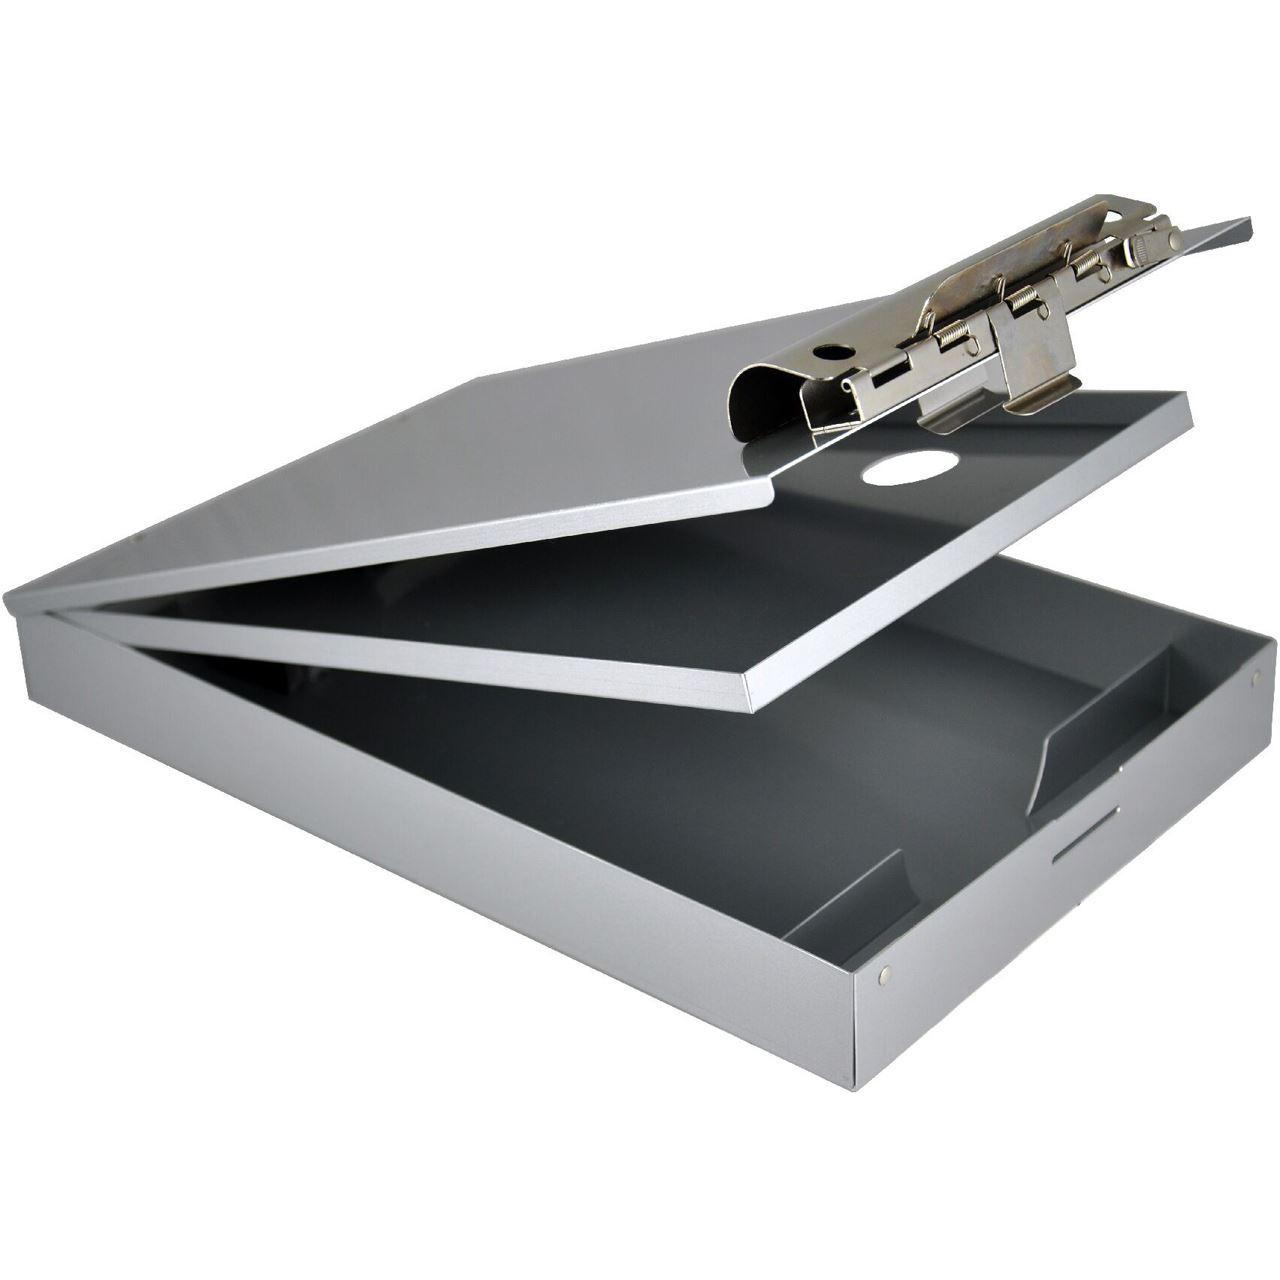 SAUNDERS Klemmbrett ´Cruiser Mate´ 4026795210178 216 x 330 mm Format